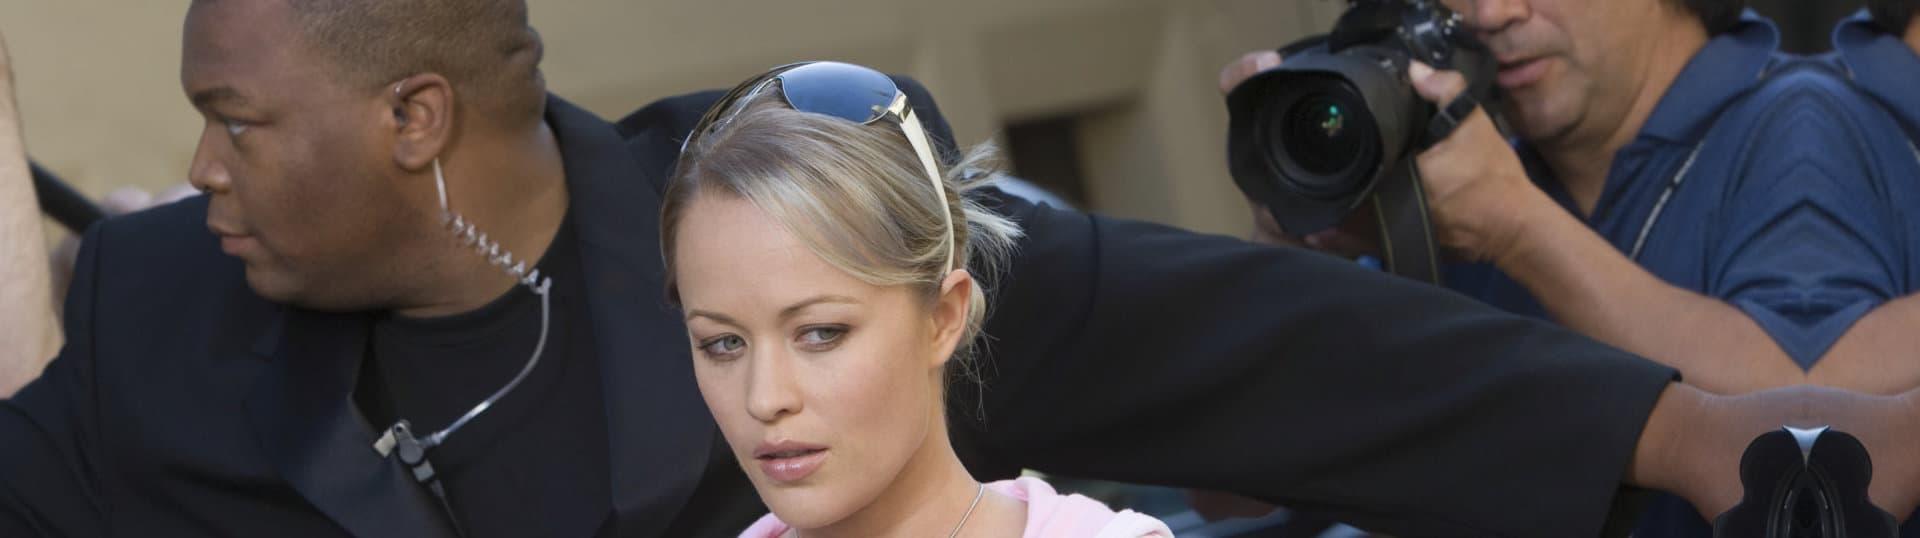 Closeup of a female celebrity and bodyguard